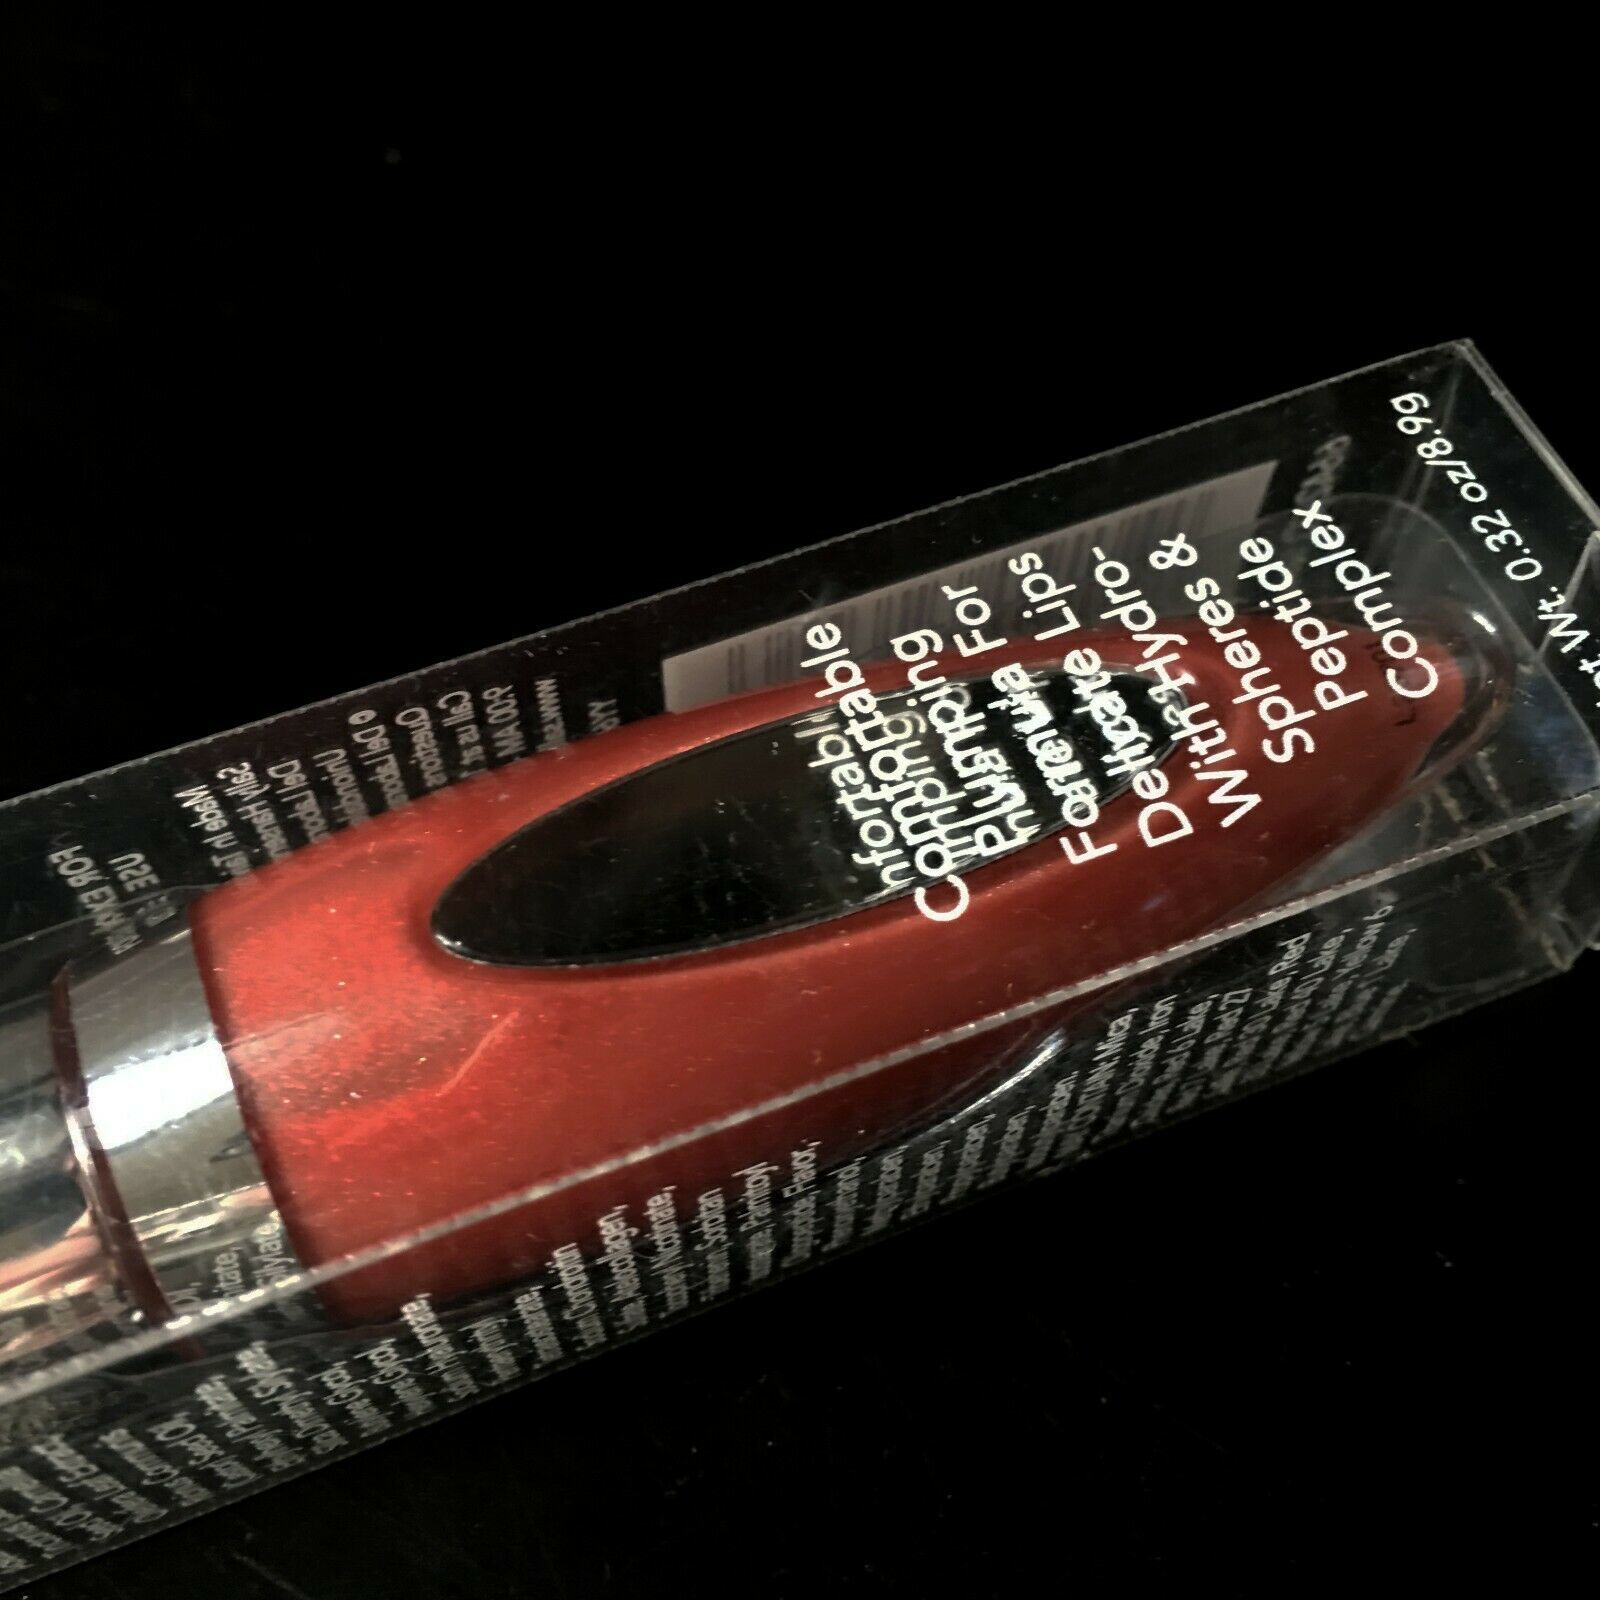 SALLY HANSEN*Tube GENTLE PLUMPING Color LIP TREATMENT Gloss TEASE Boxed #6642-20